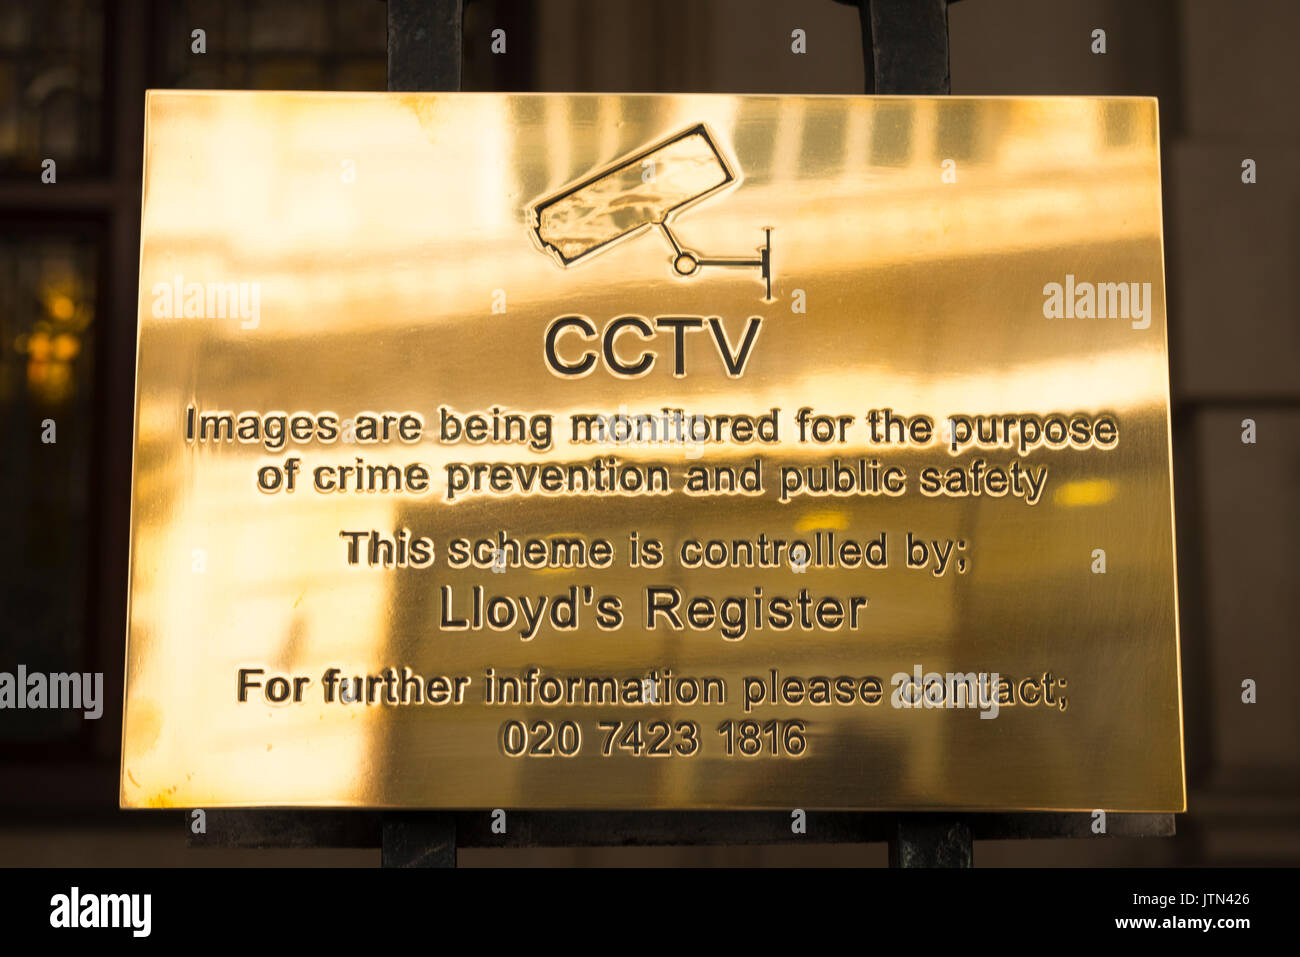 Großbritannien London City Centre 71 Fenchurch Street Lloyd's Register der Versand Messingblech Plakette gegründet Stockfoto